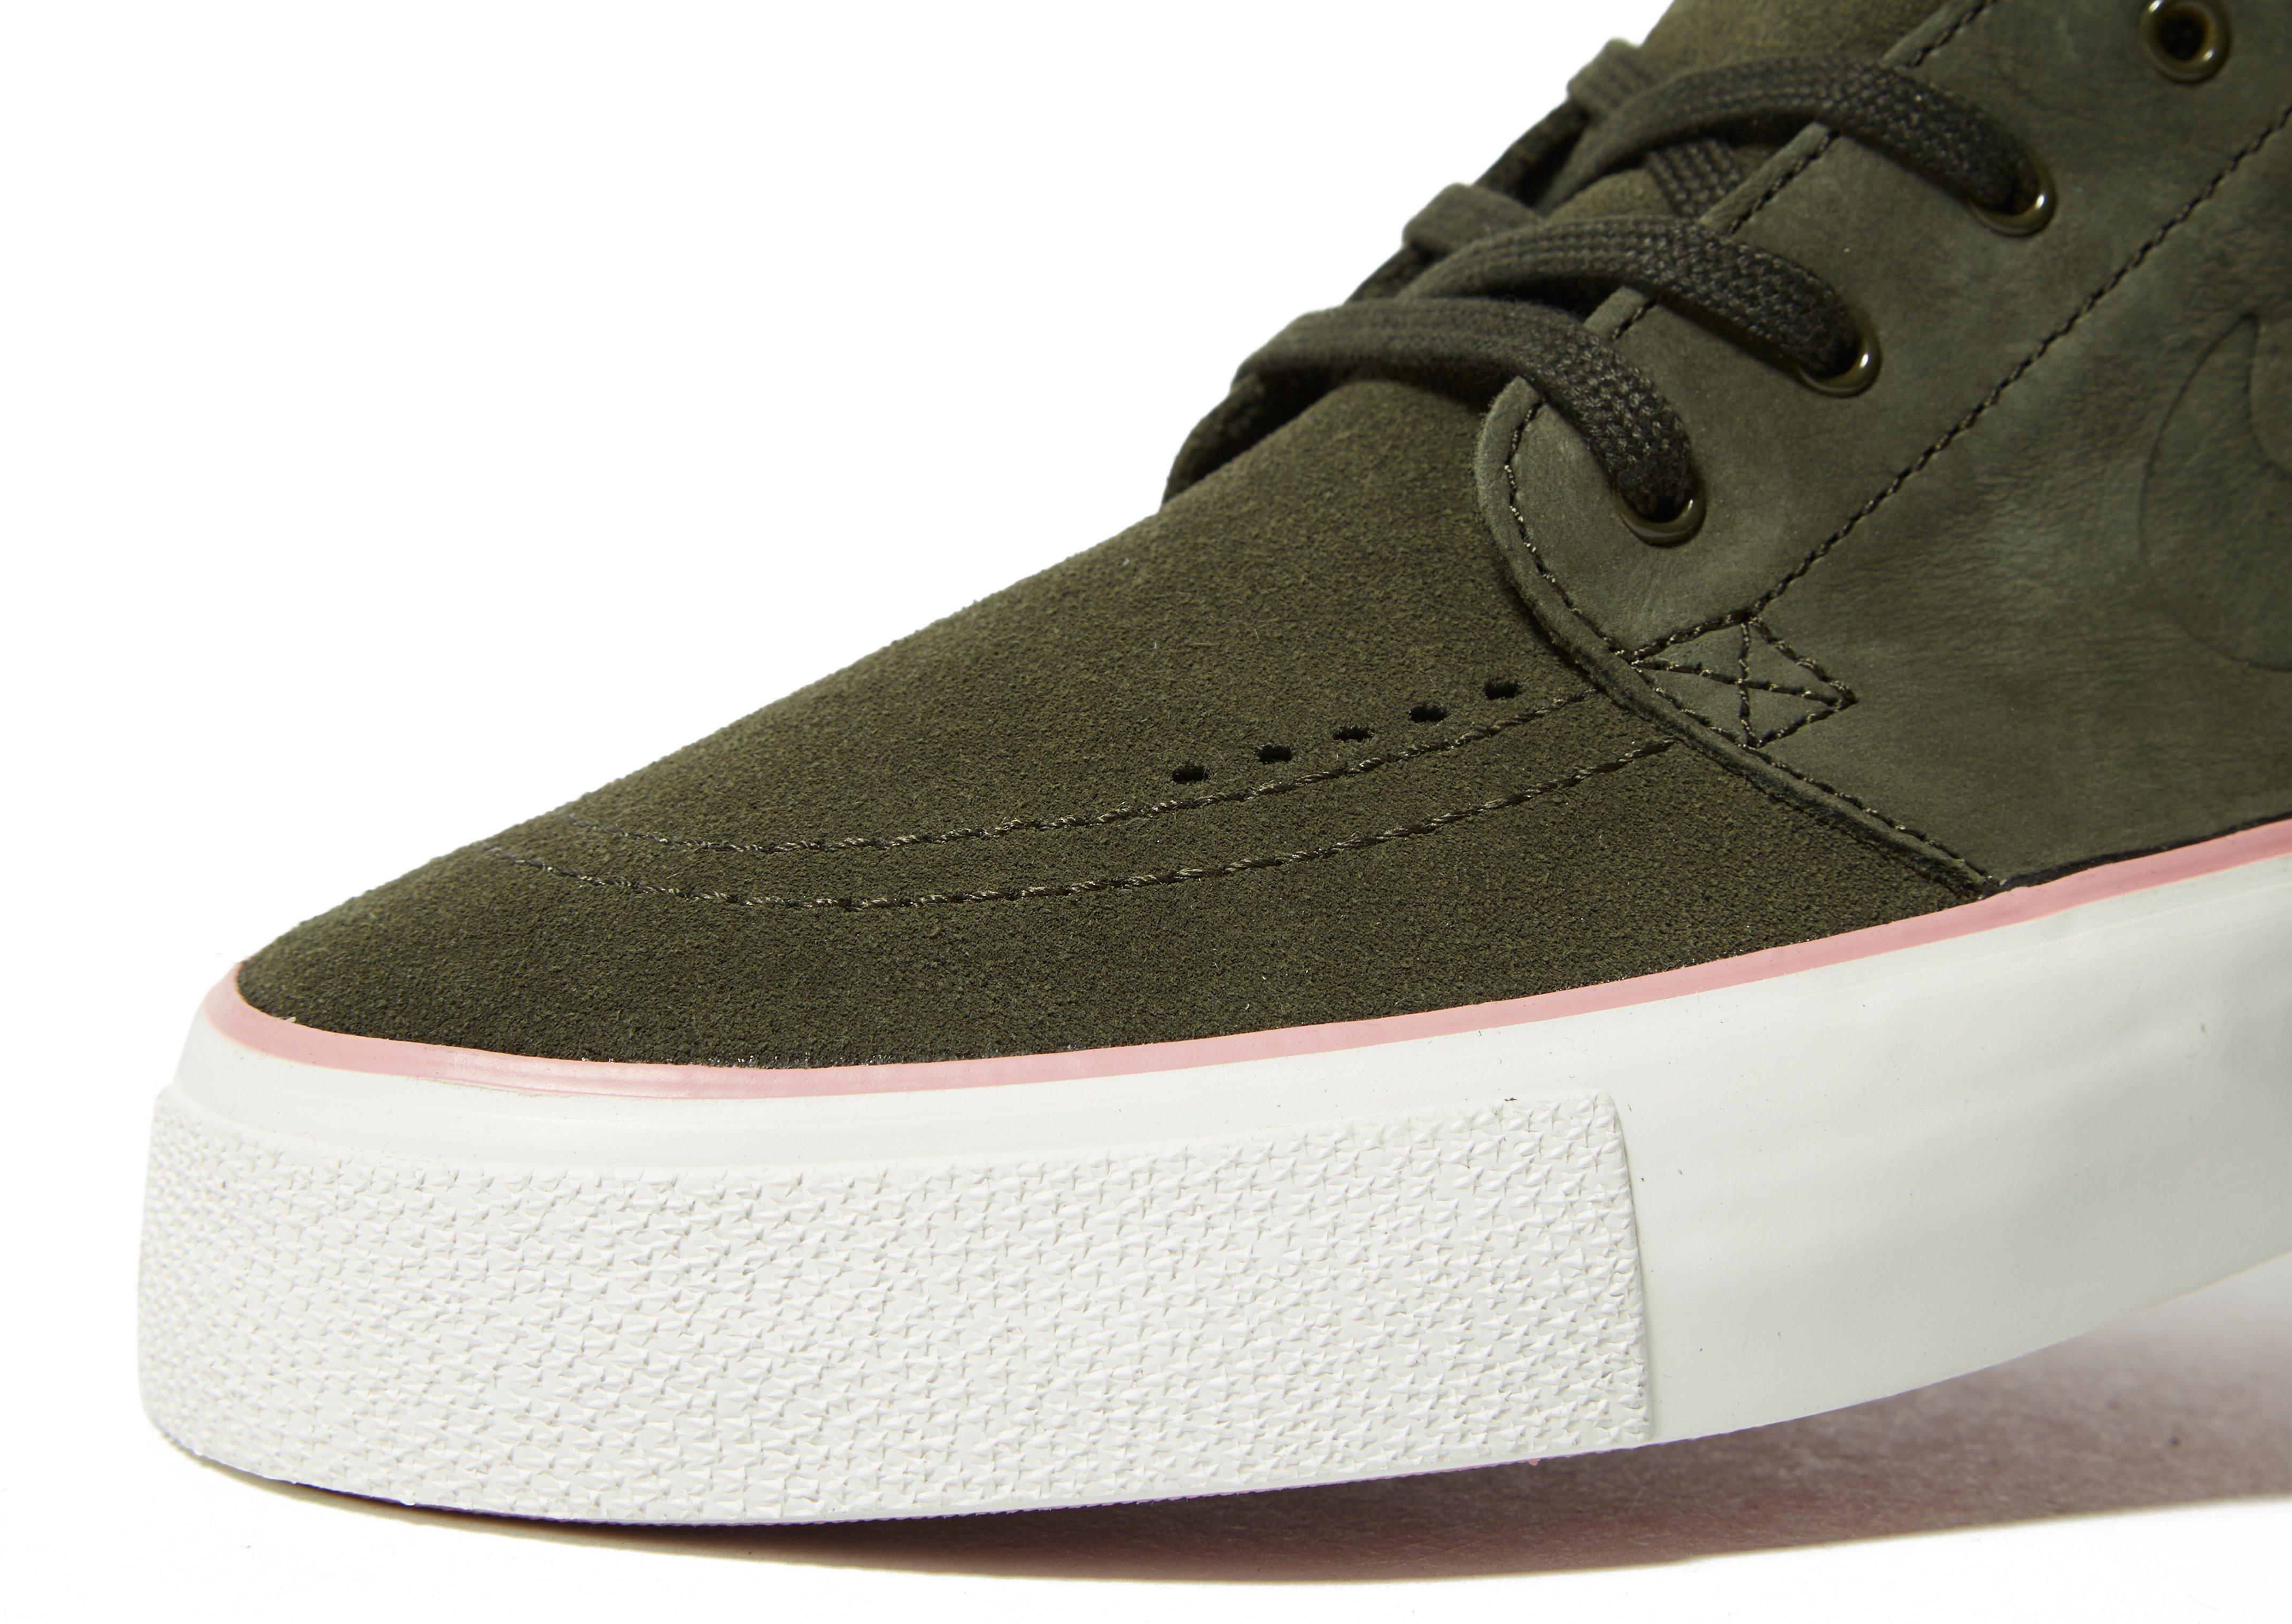 cc5951e0117 Nike Run Swift Drop Offer On Shoes